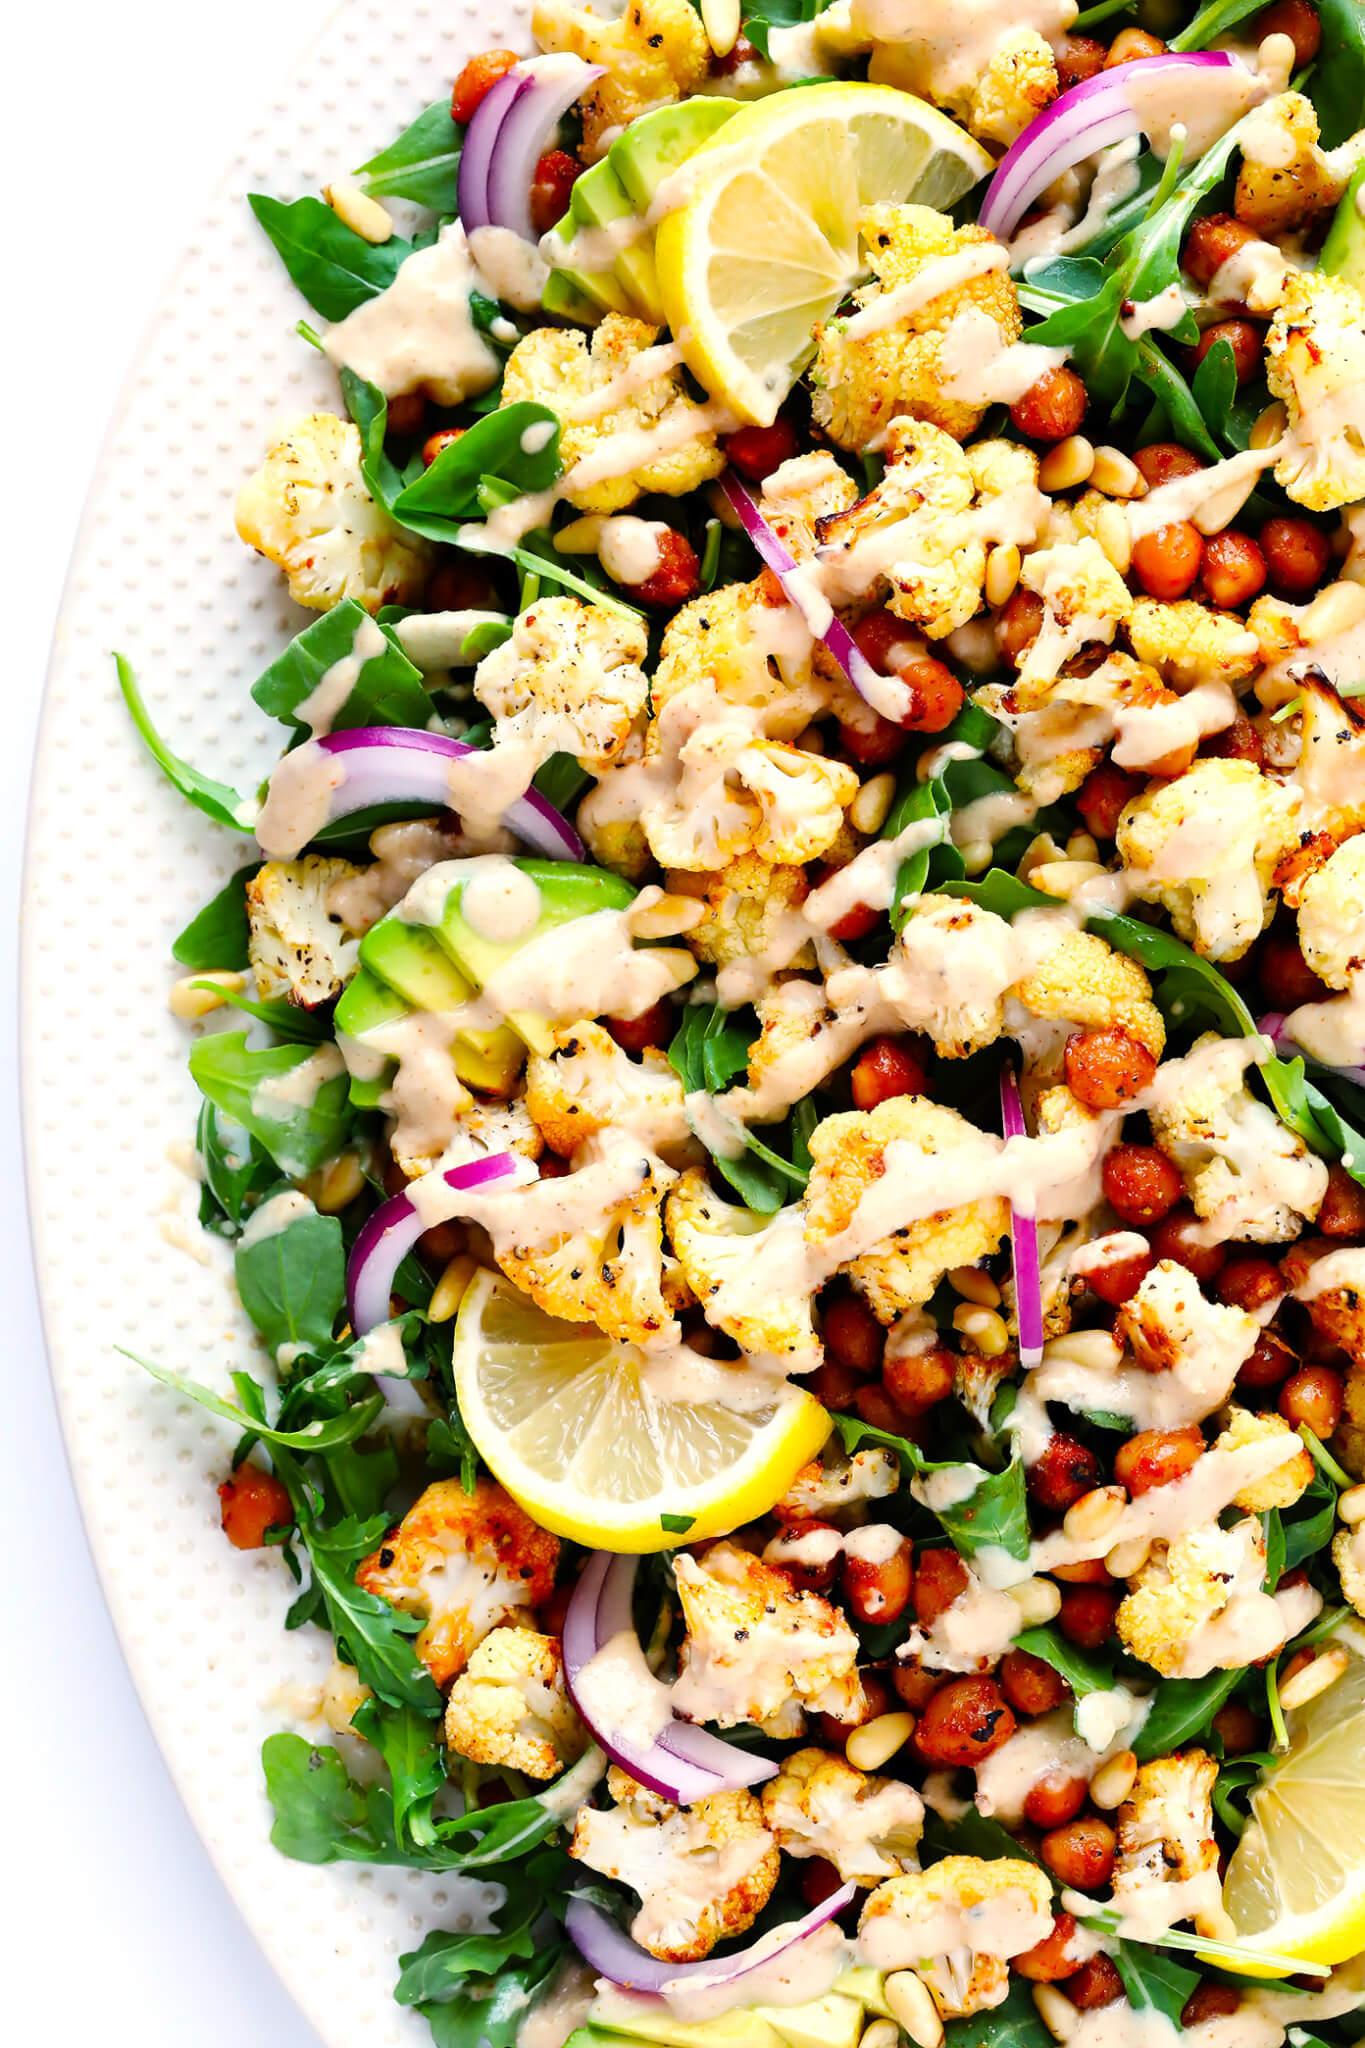 Vegetarian Roasted Cauliflower, Chickpea and Arugula Salad with Dreamy Tahini Dressing